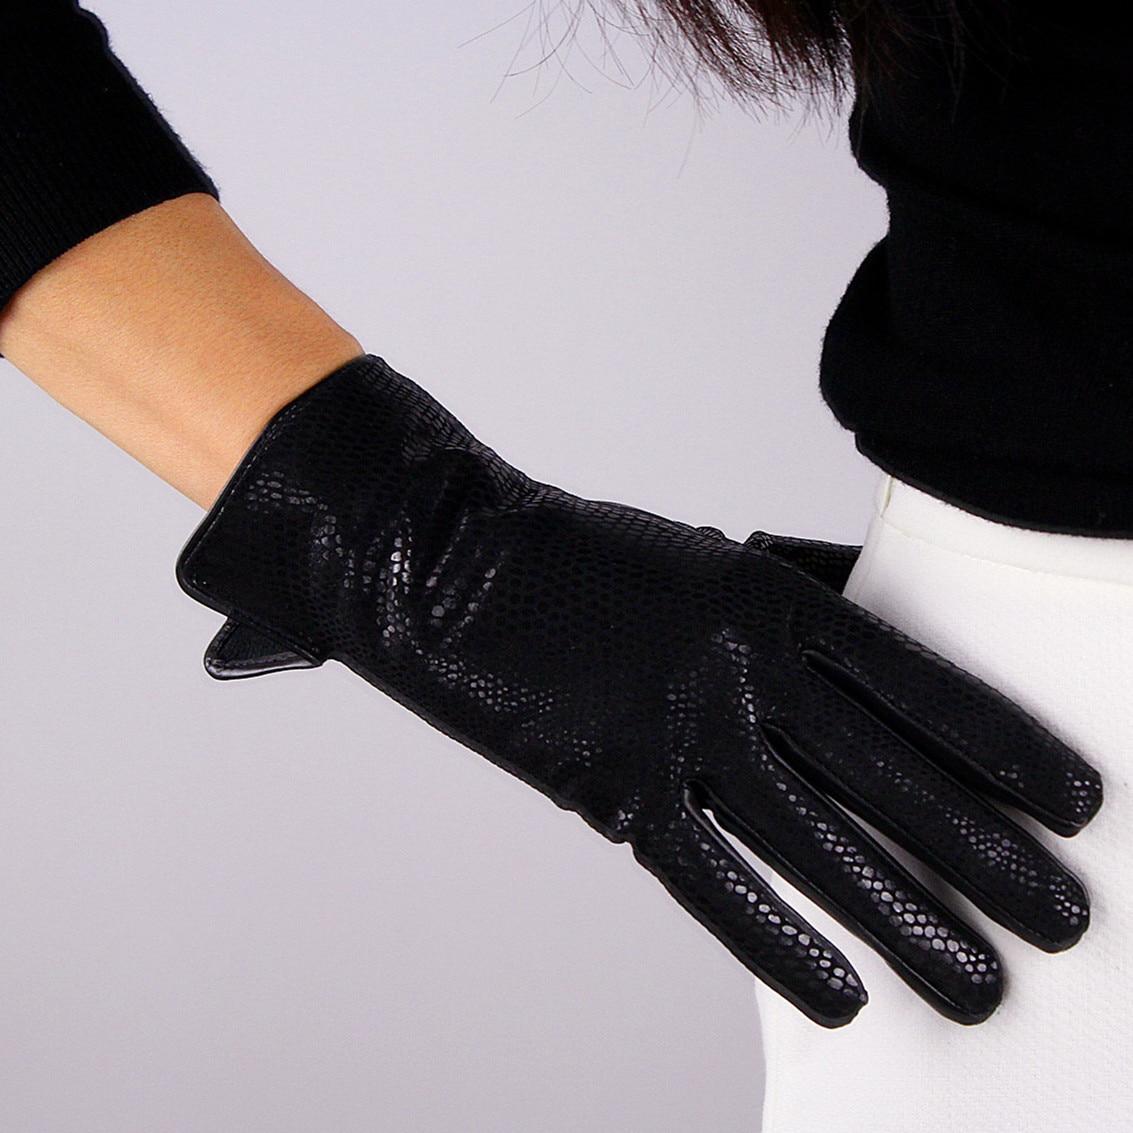 Womens black leather gloves medium - 2017 Fashion Gloves Genuine Pure Sheepskin Leather Black Serpentine Pattern Medium Long Women Velvet Lining